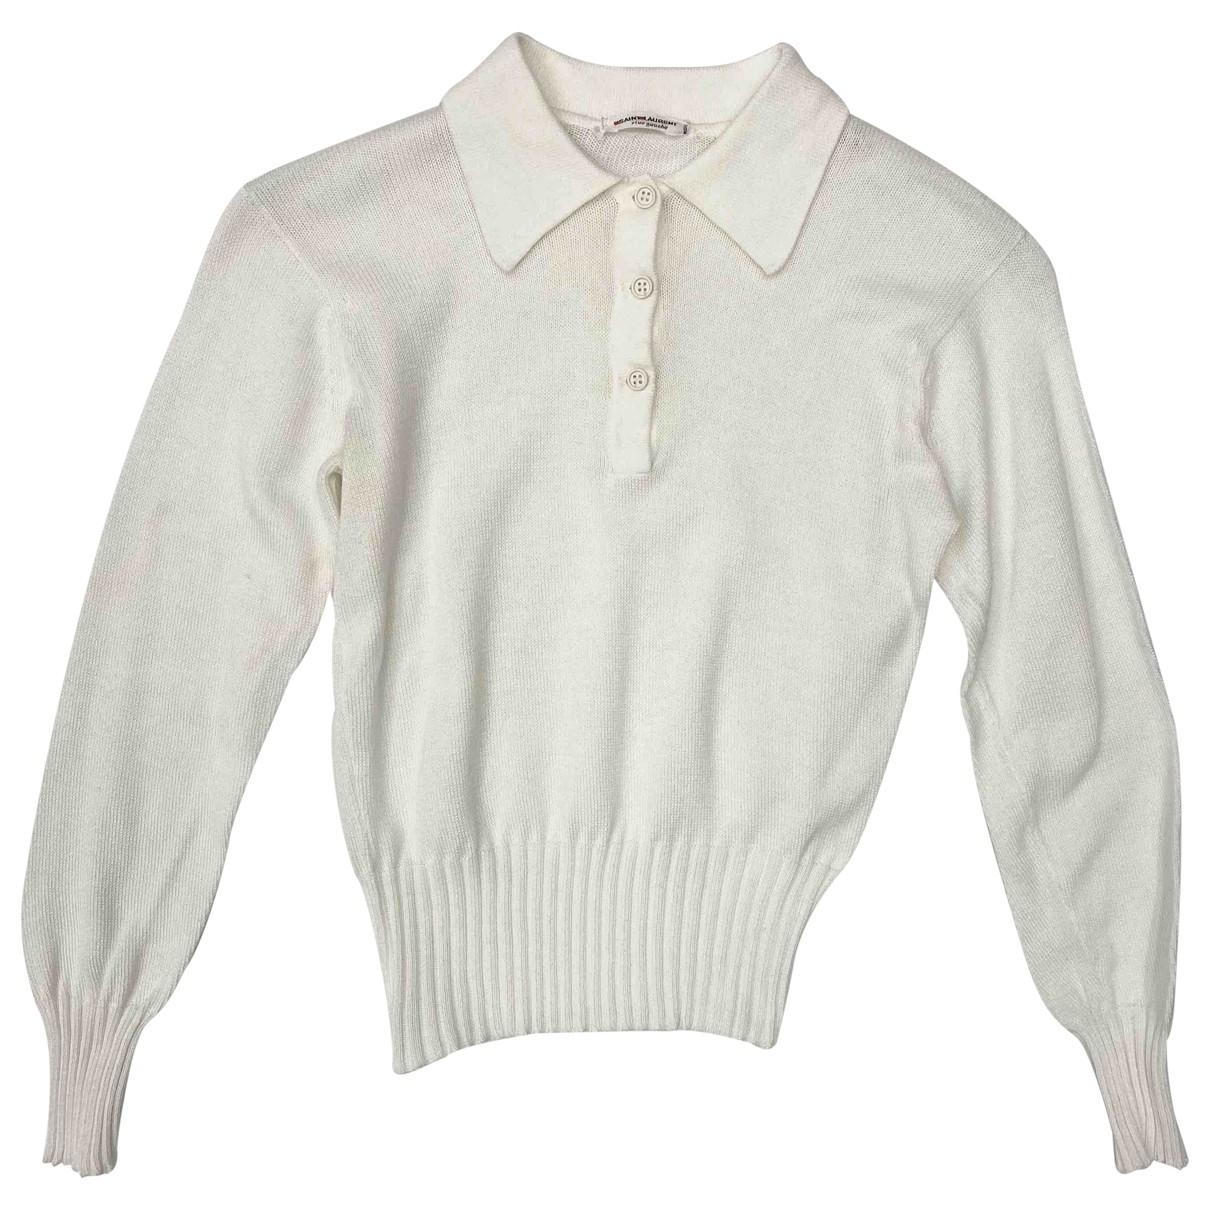 Yves Saint Laurent \N White Cotton Knitwear for Women XS International